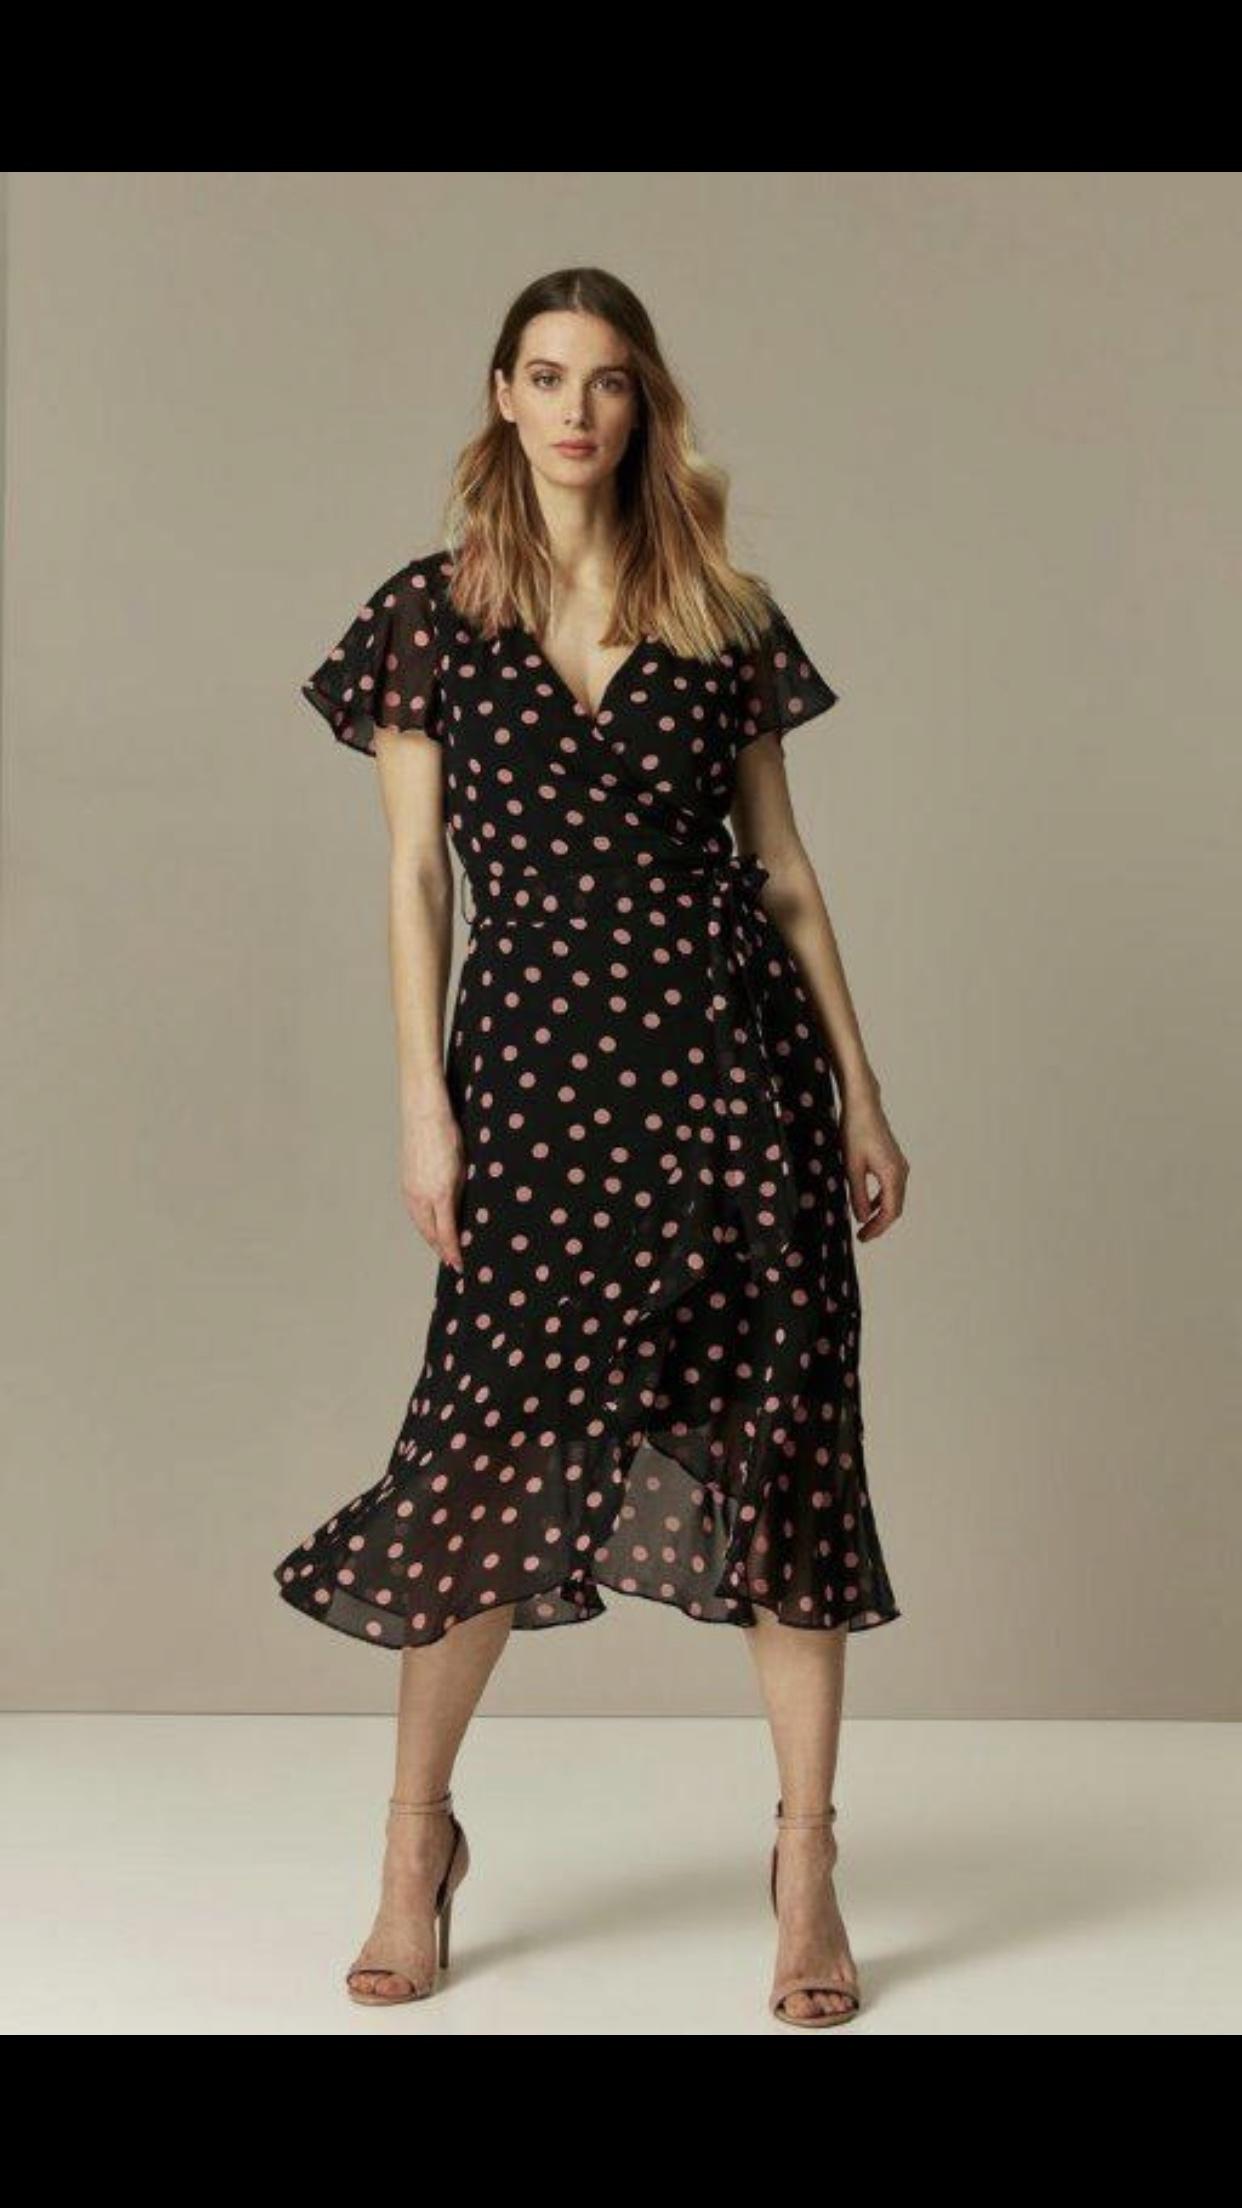 Stella Floral Print V-Neck Midi Dress in Navy   iCLOTHING